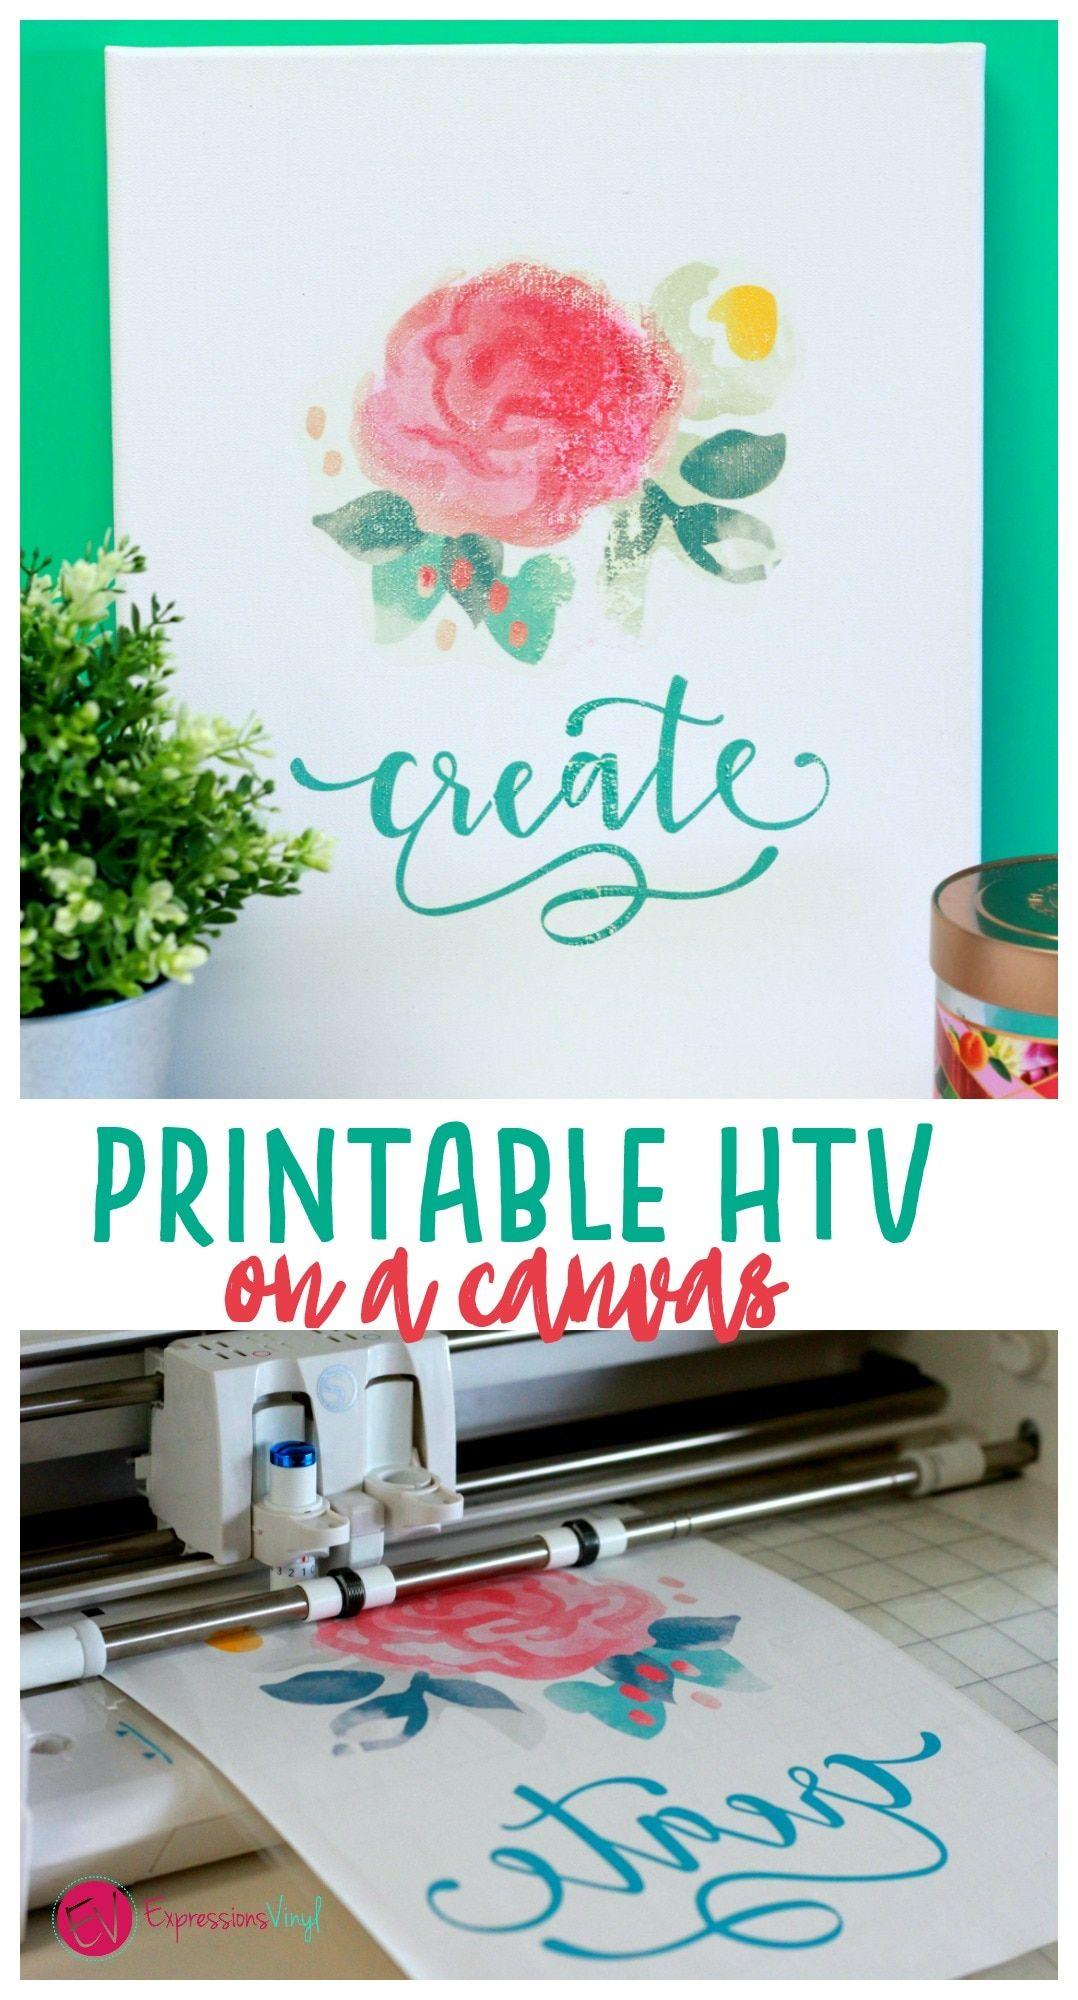 graphic regarding Printable Iron on Vinyl identify Printable HTV upon canvas Cricut initiatives Printable htv